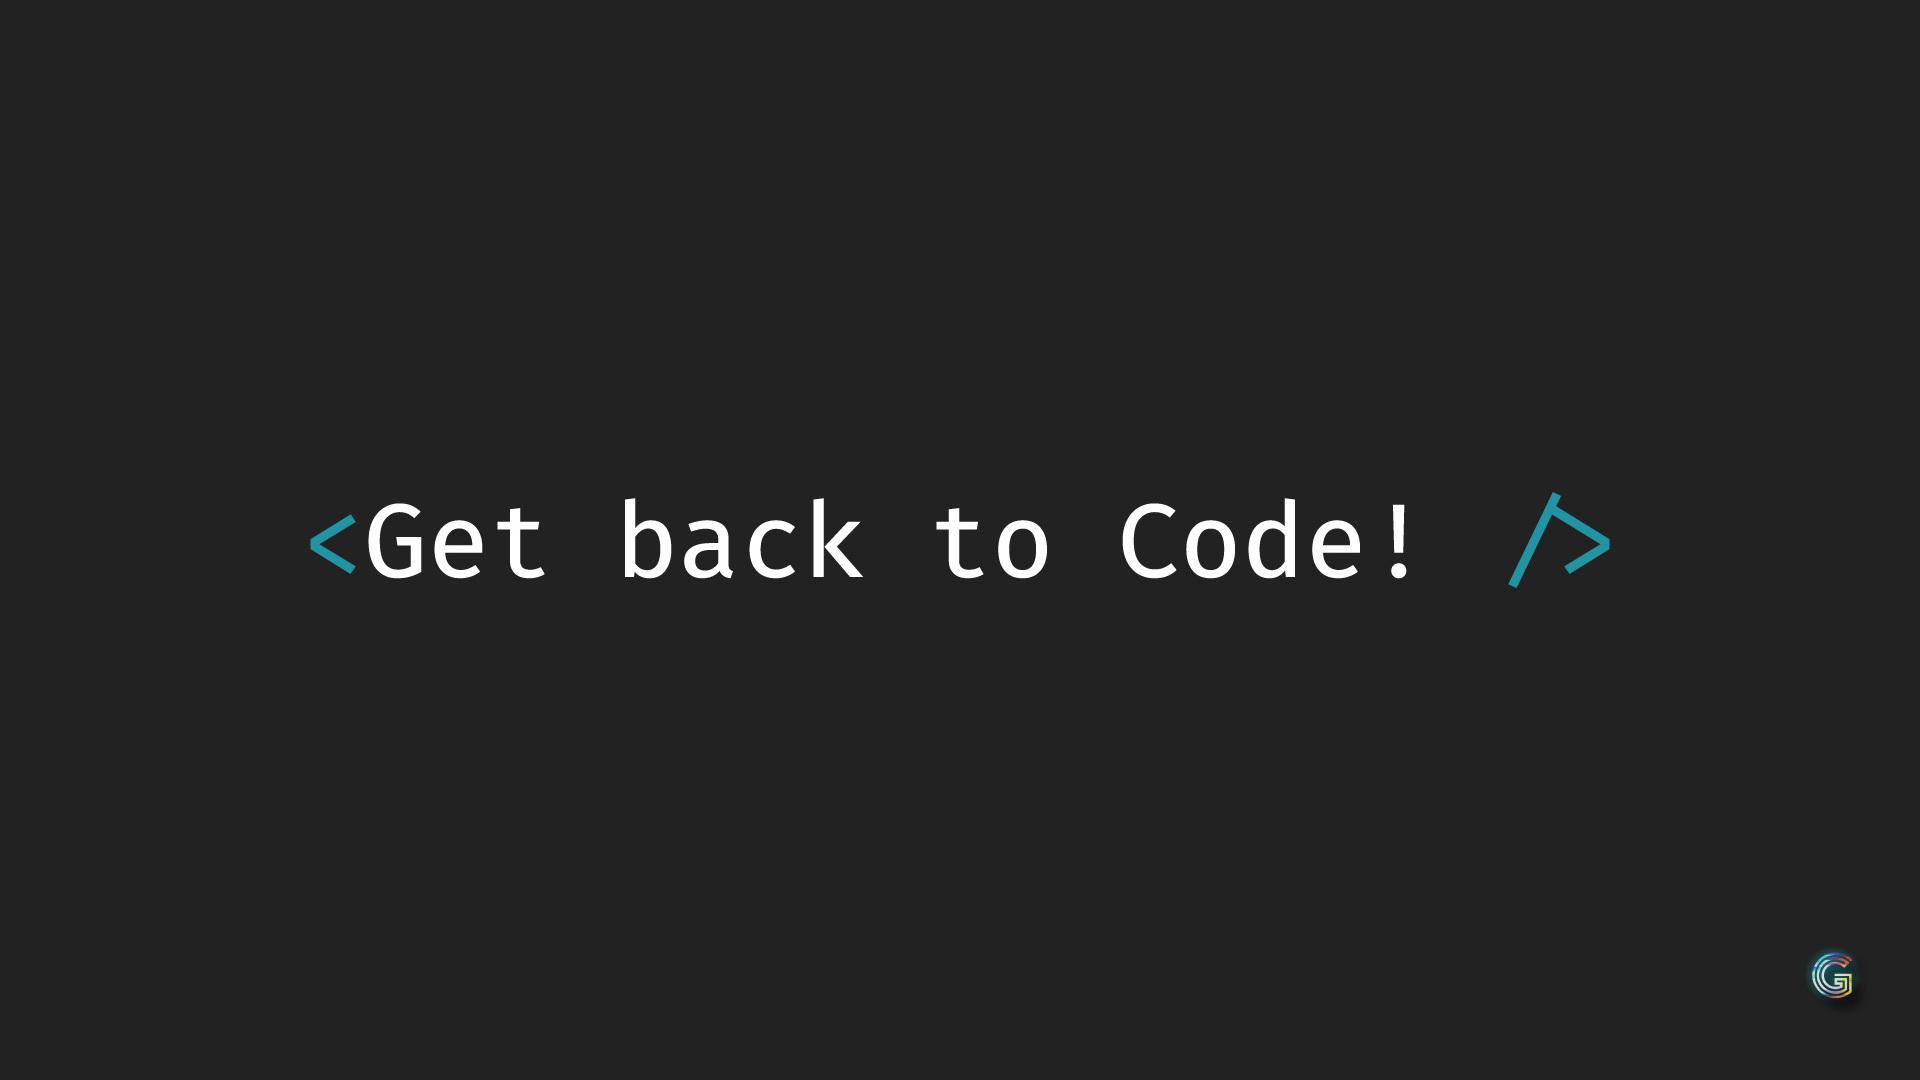 get-back-to-code-km.jpg